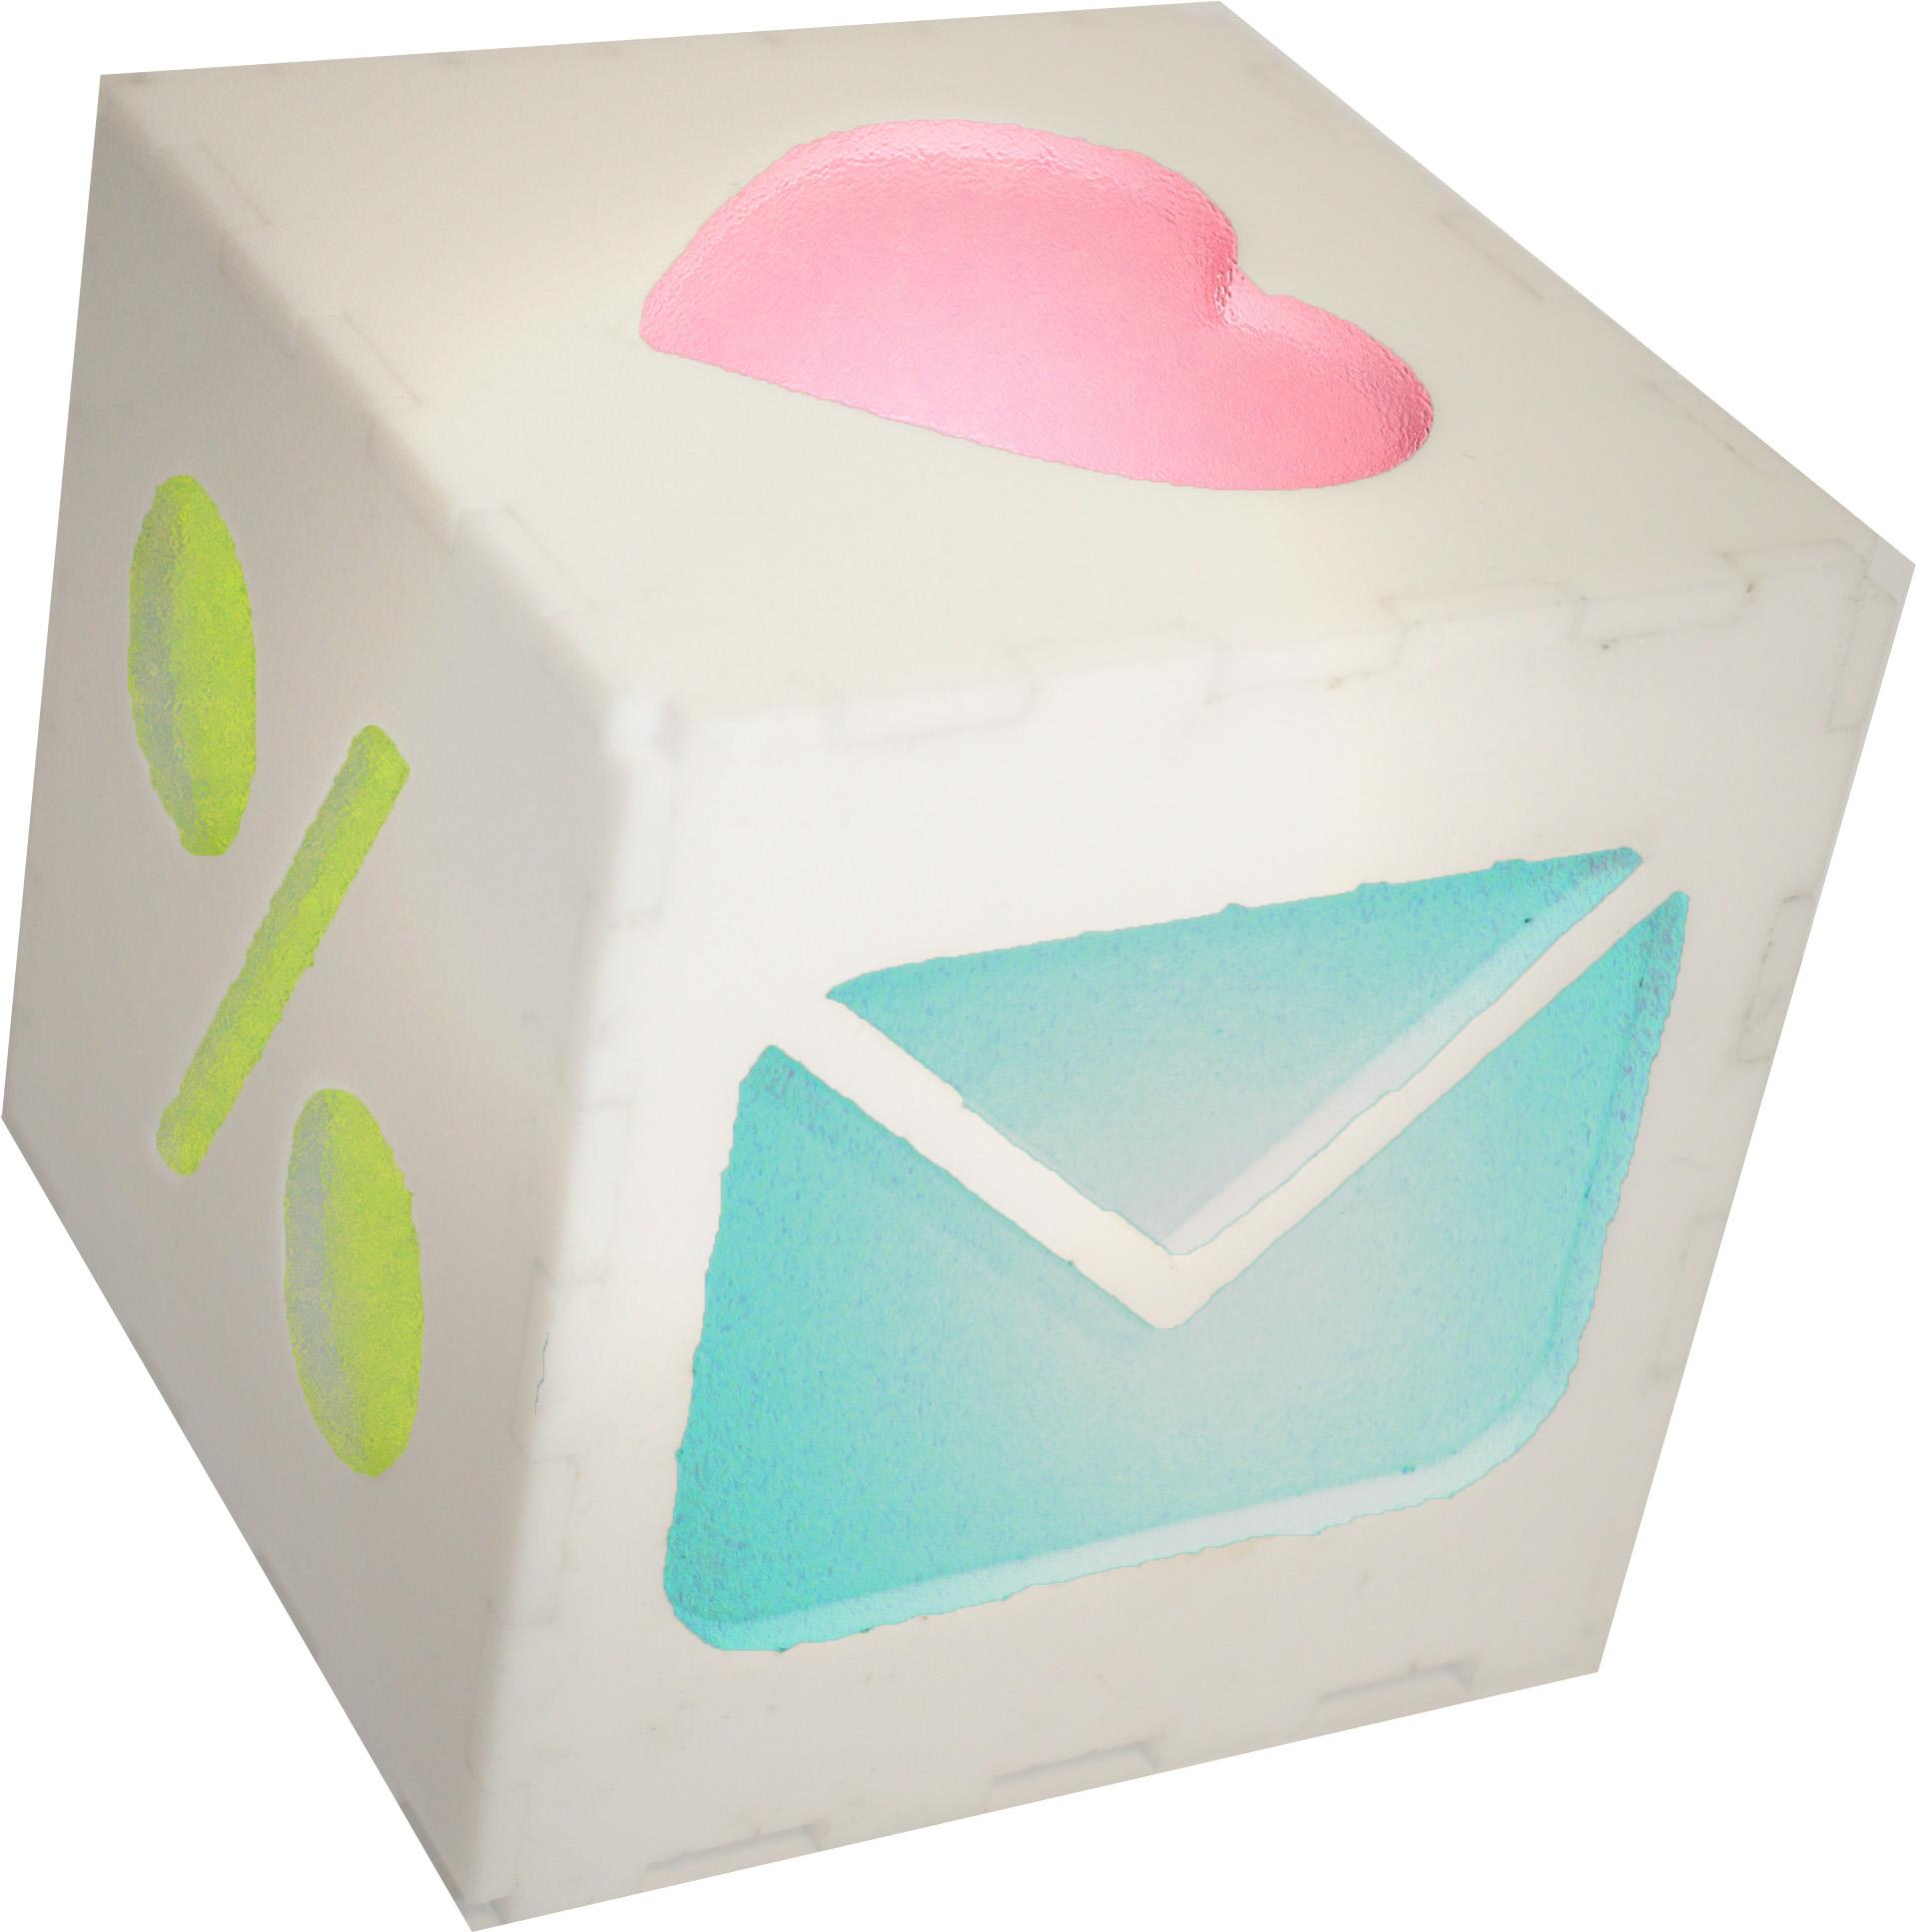 Boxglow